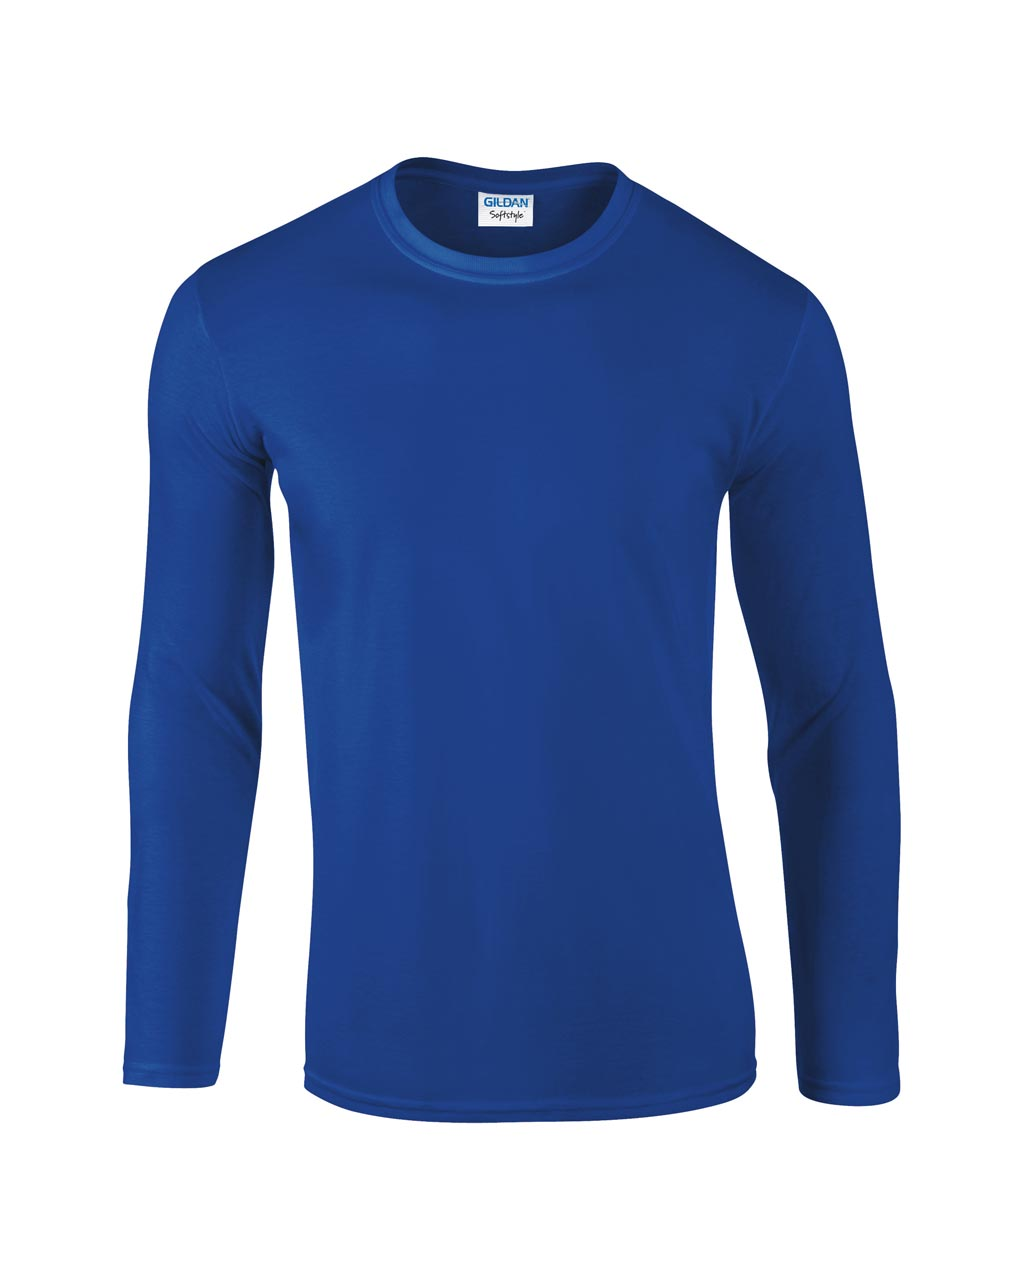 Tricou maneca lunga barbat bumbac premium softstyle serigrafie broderie termotransfer DTG | Toroadv.ro